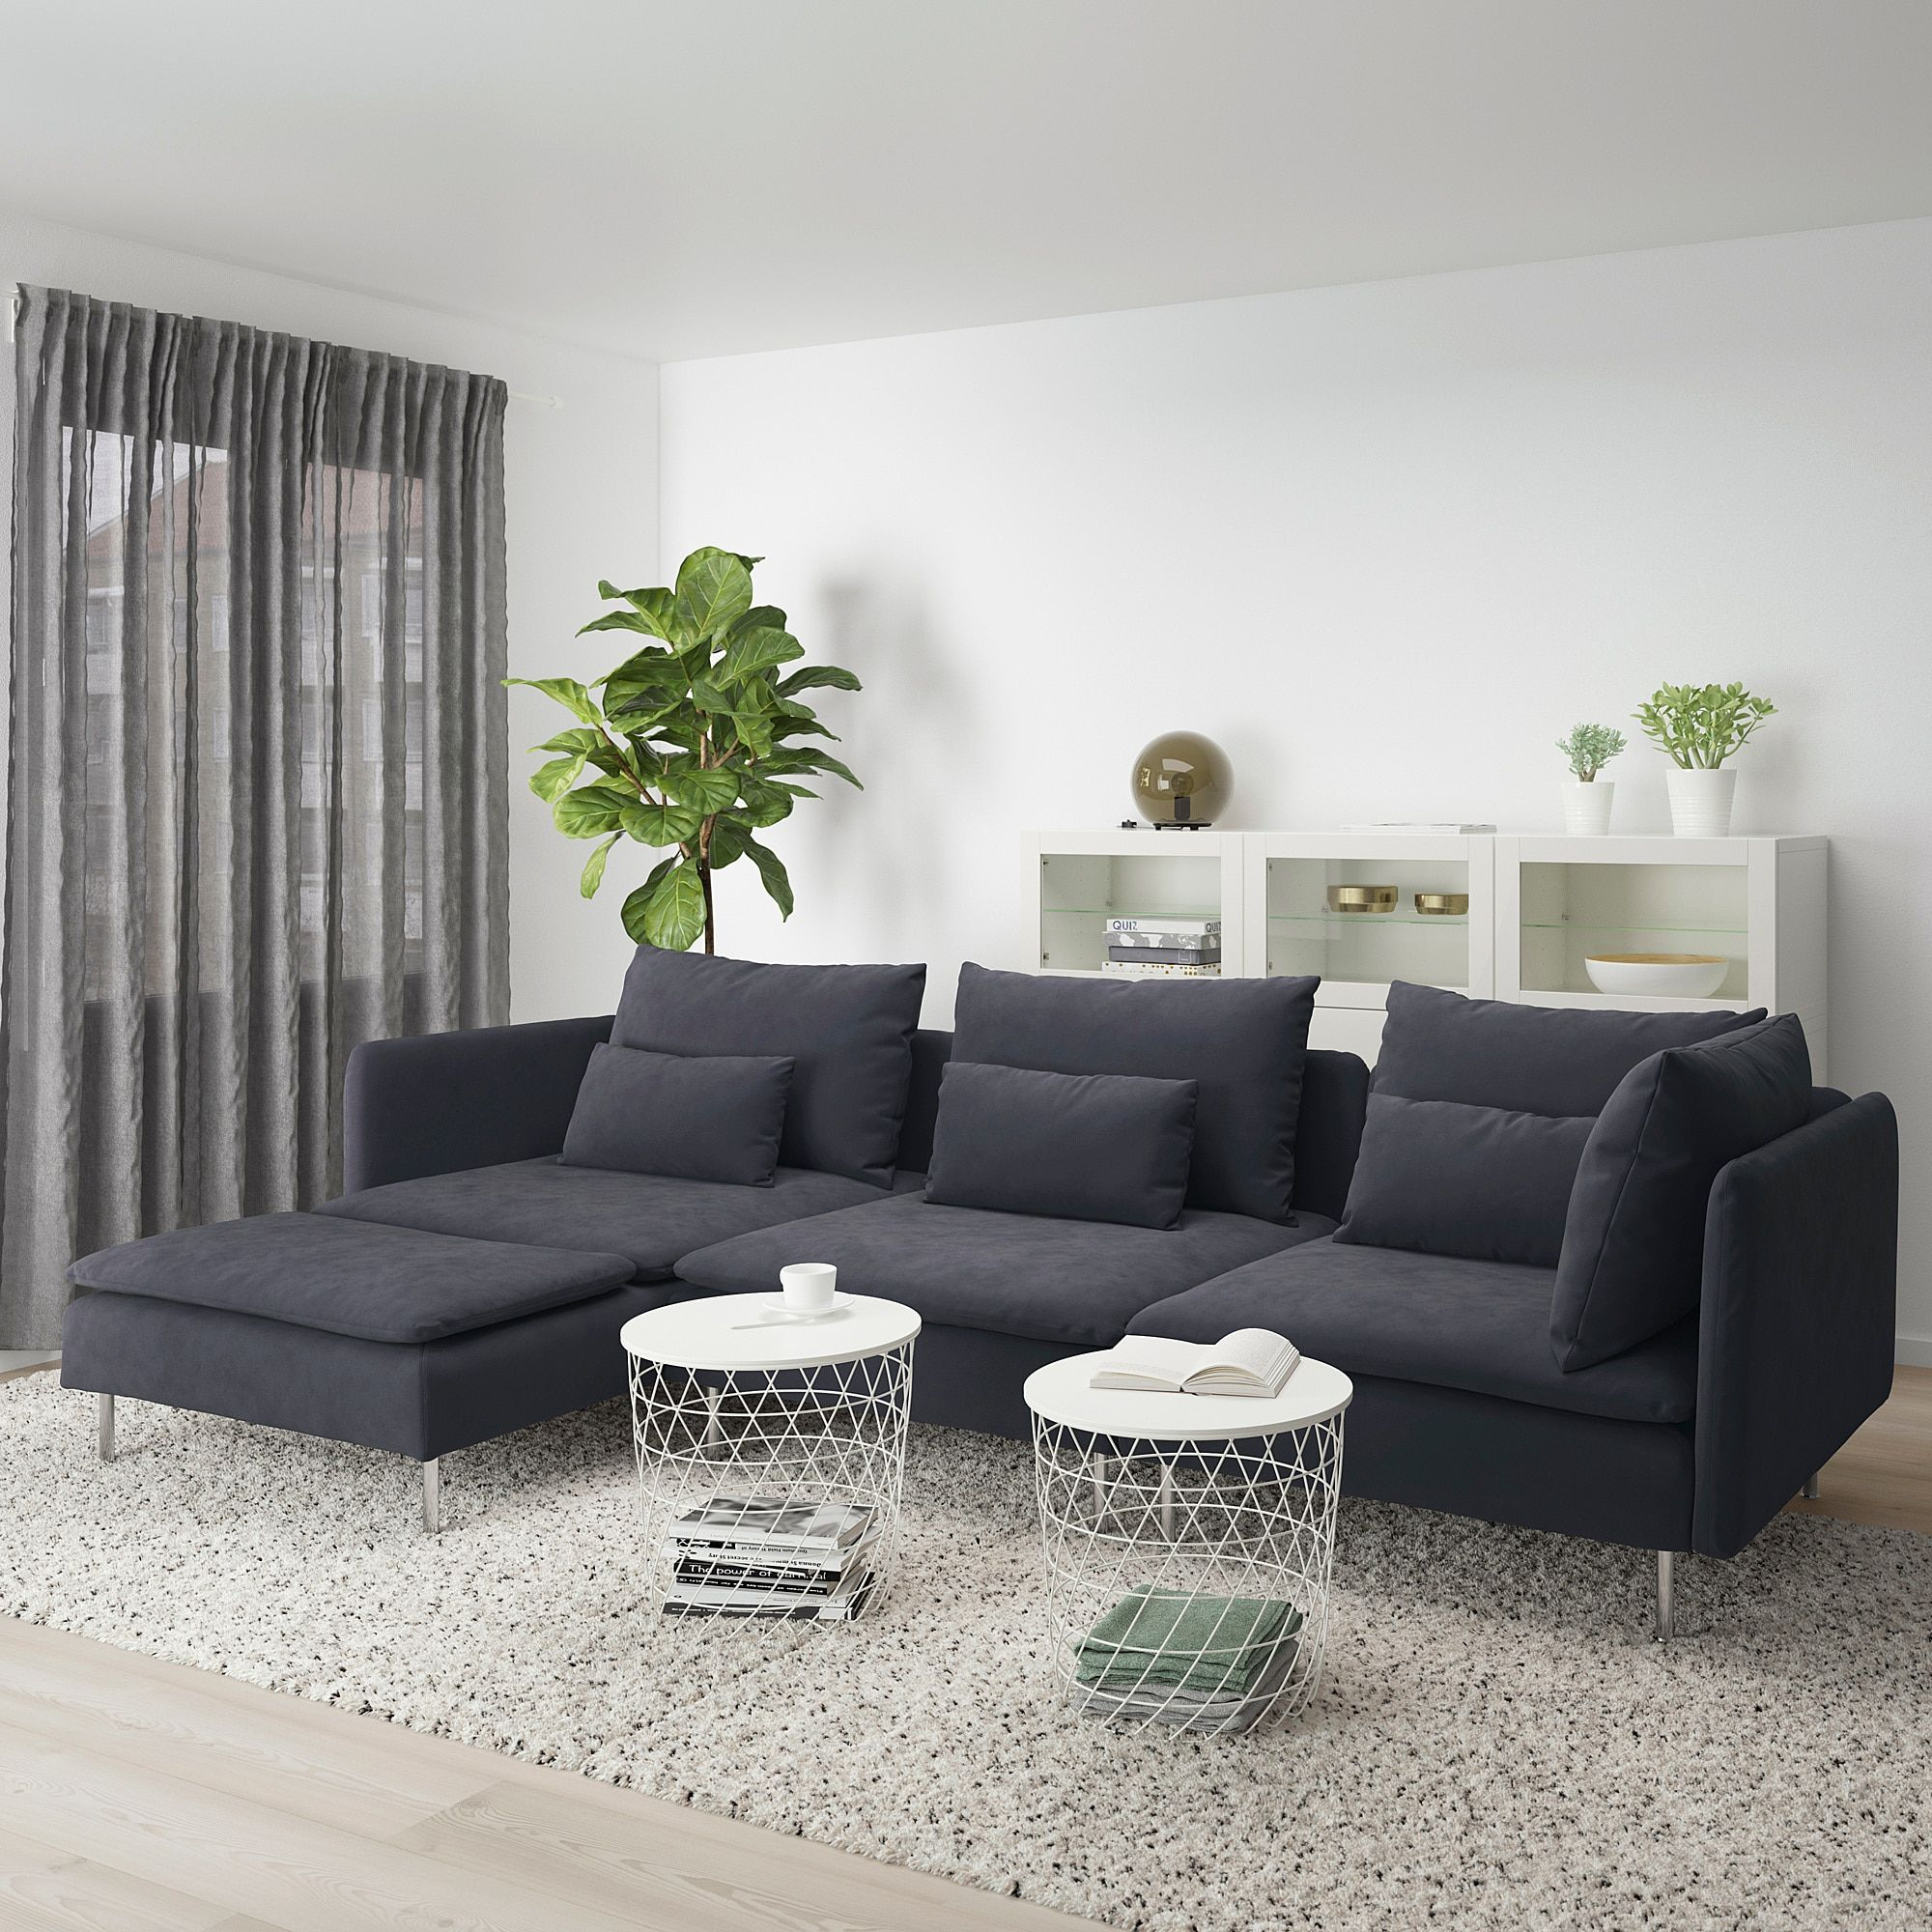 SÖDERHAMN Sectional, 12 seat   with chaise/Samsta dark gray   IKEA ...